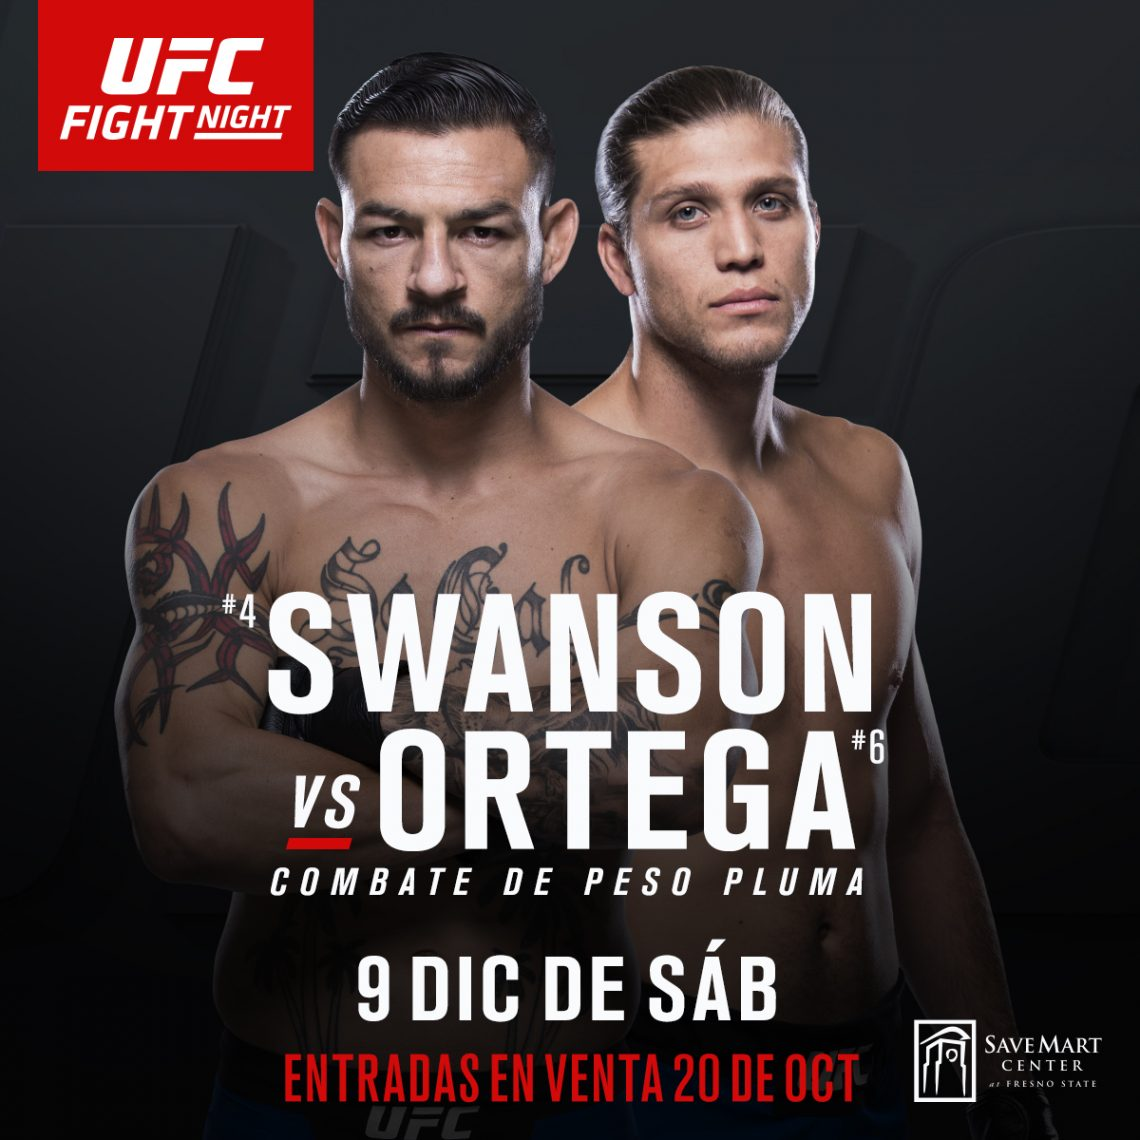 UFC Fight Night: Swanson vs. Ortega 1